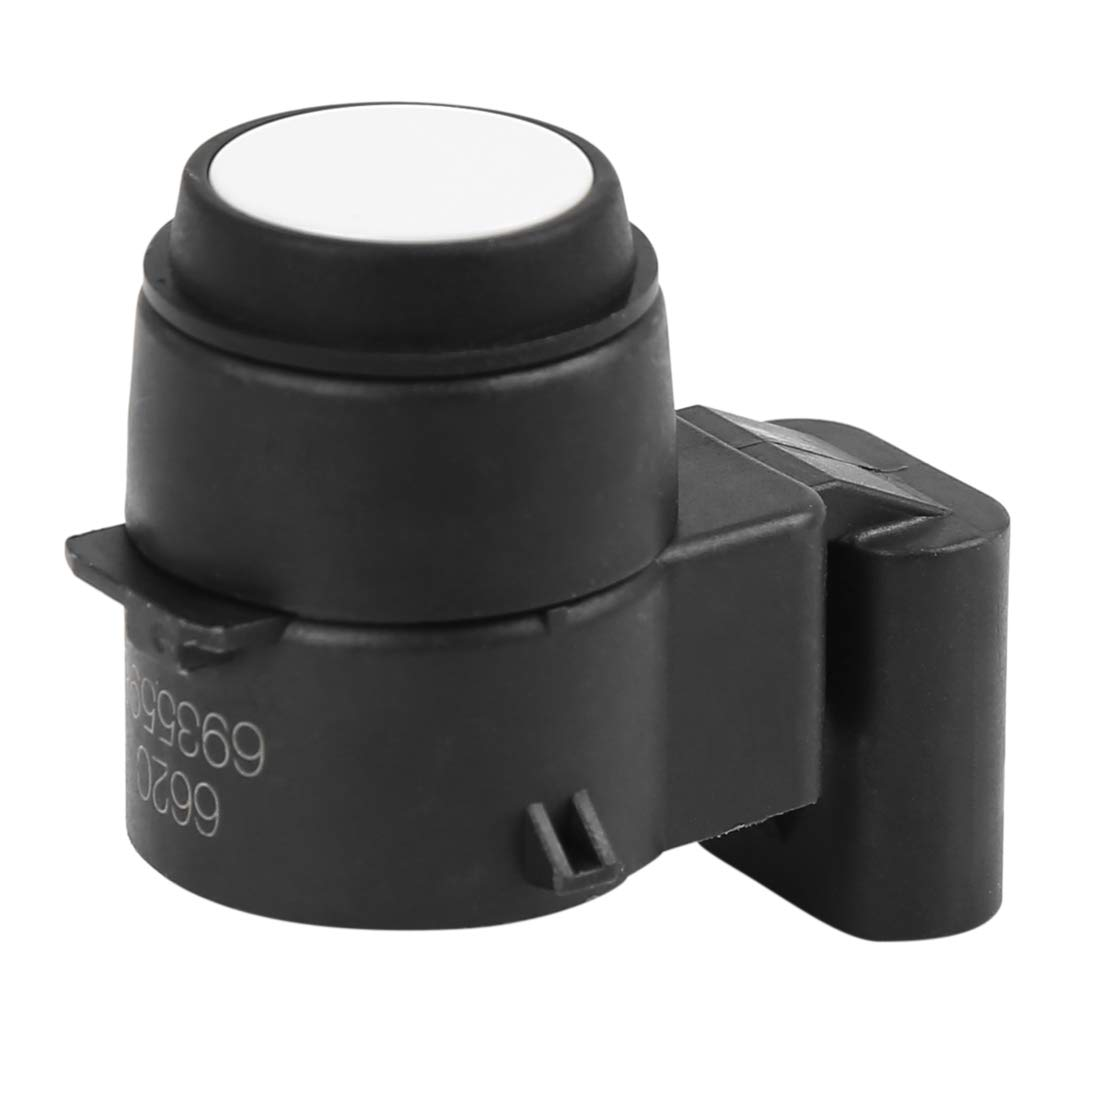 X AUTOHAUX 66206935598 Car Bumper Reverse Parking Sensor for BMW 1 3 Series E81 E87